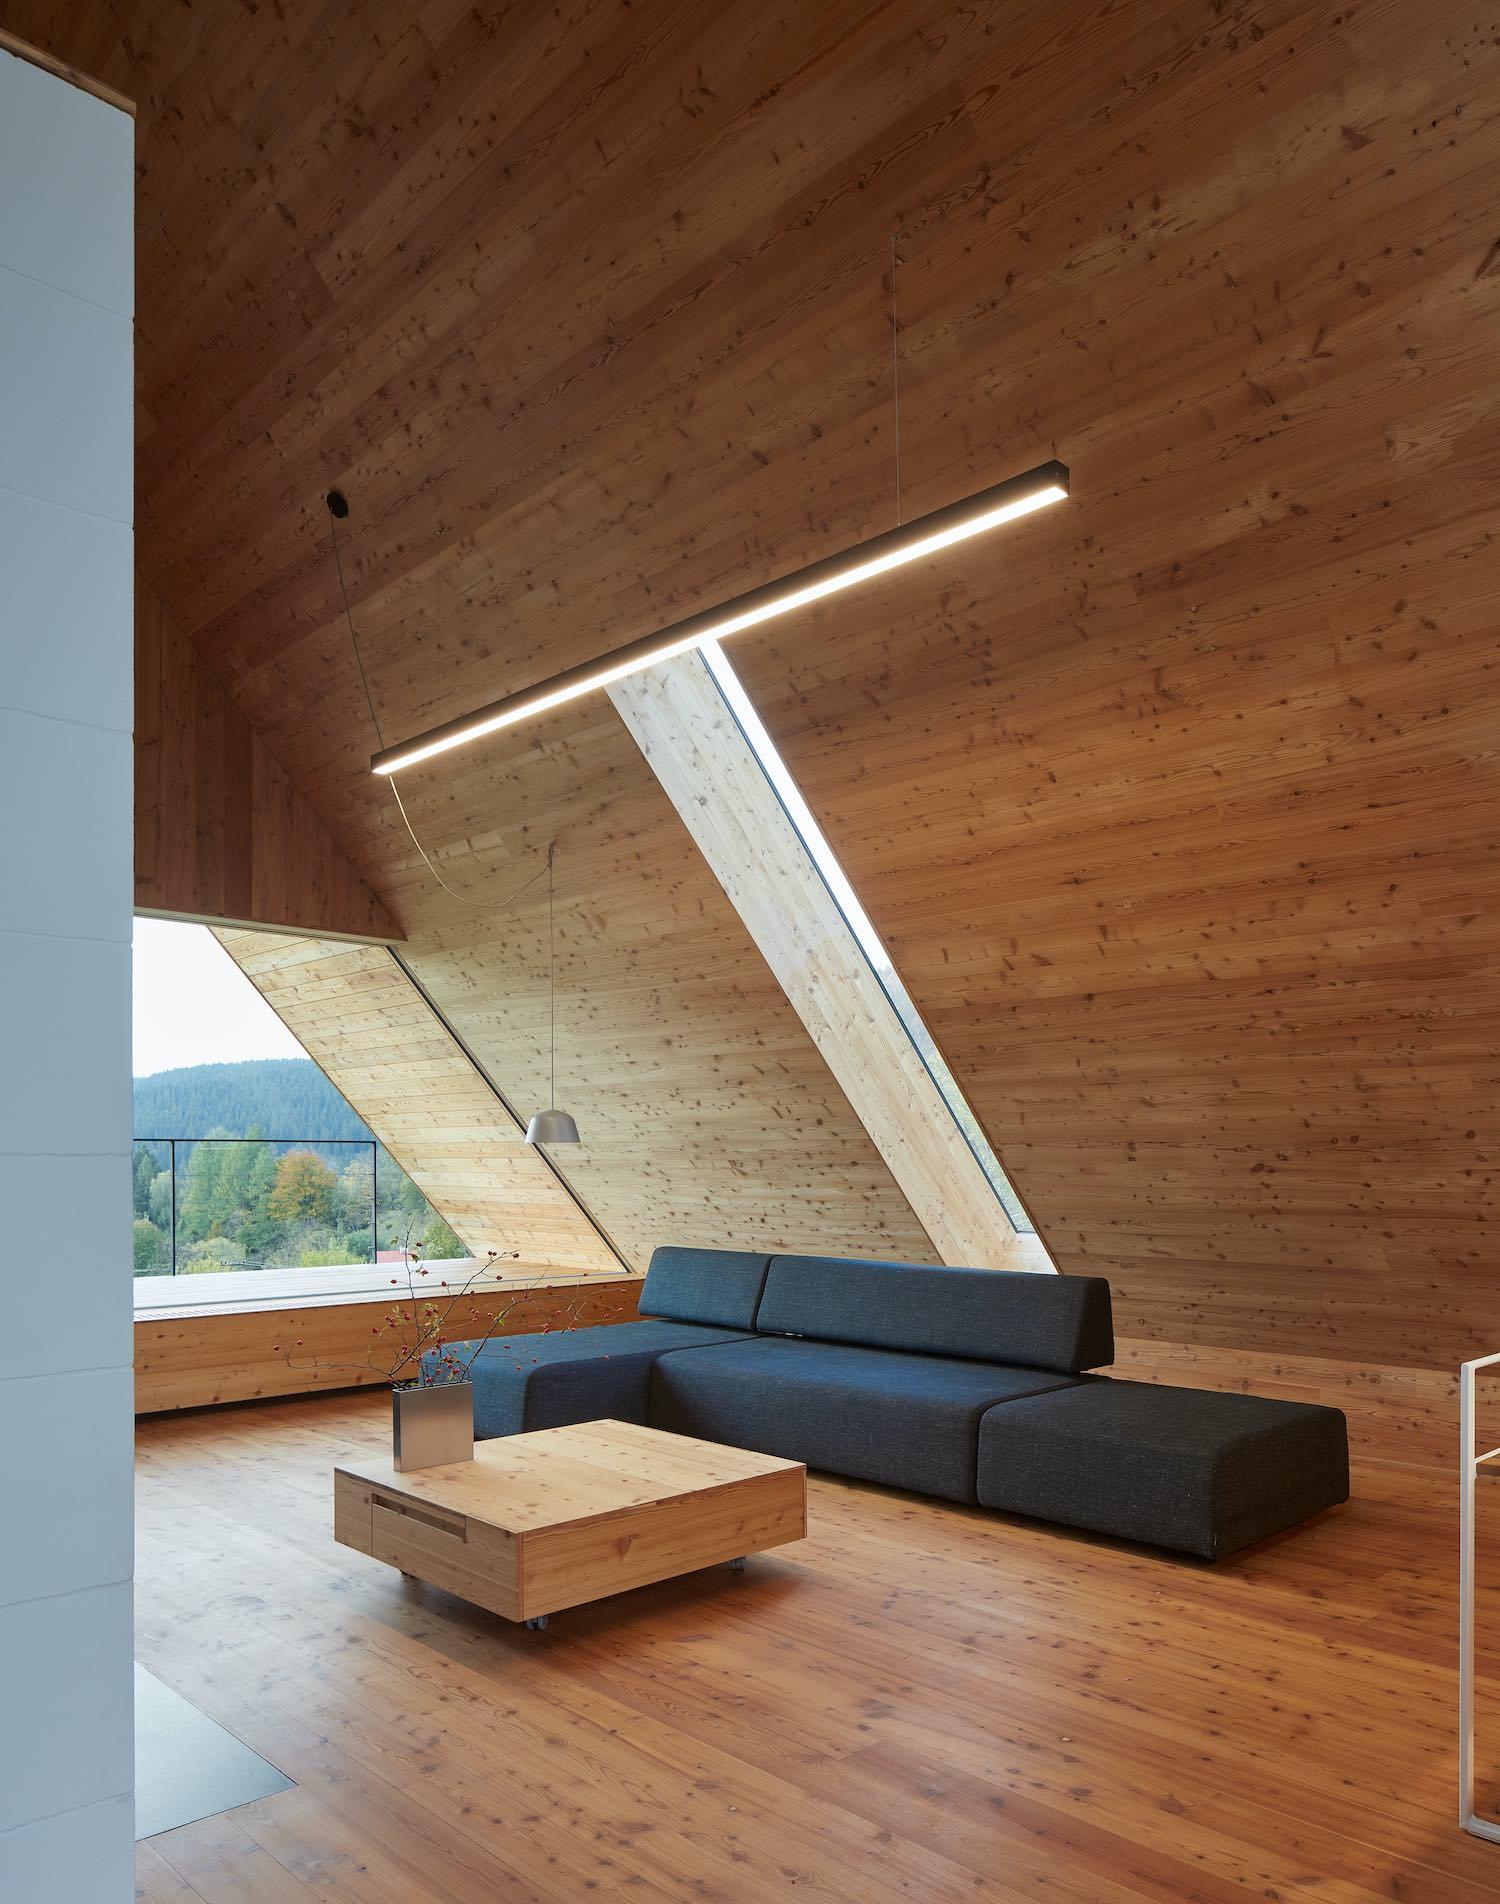 sun light enters the living room through skylight and large triangular window